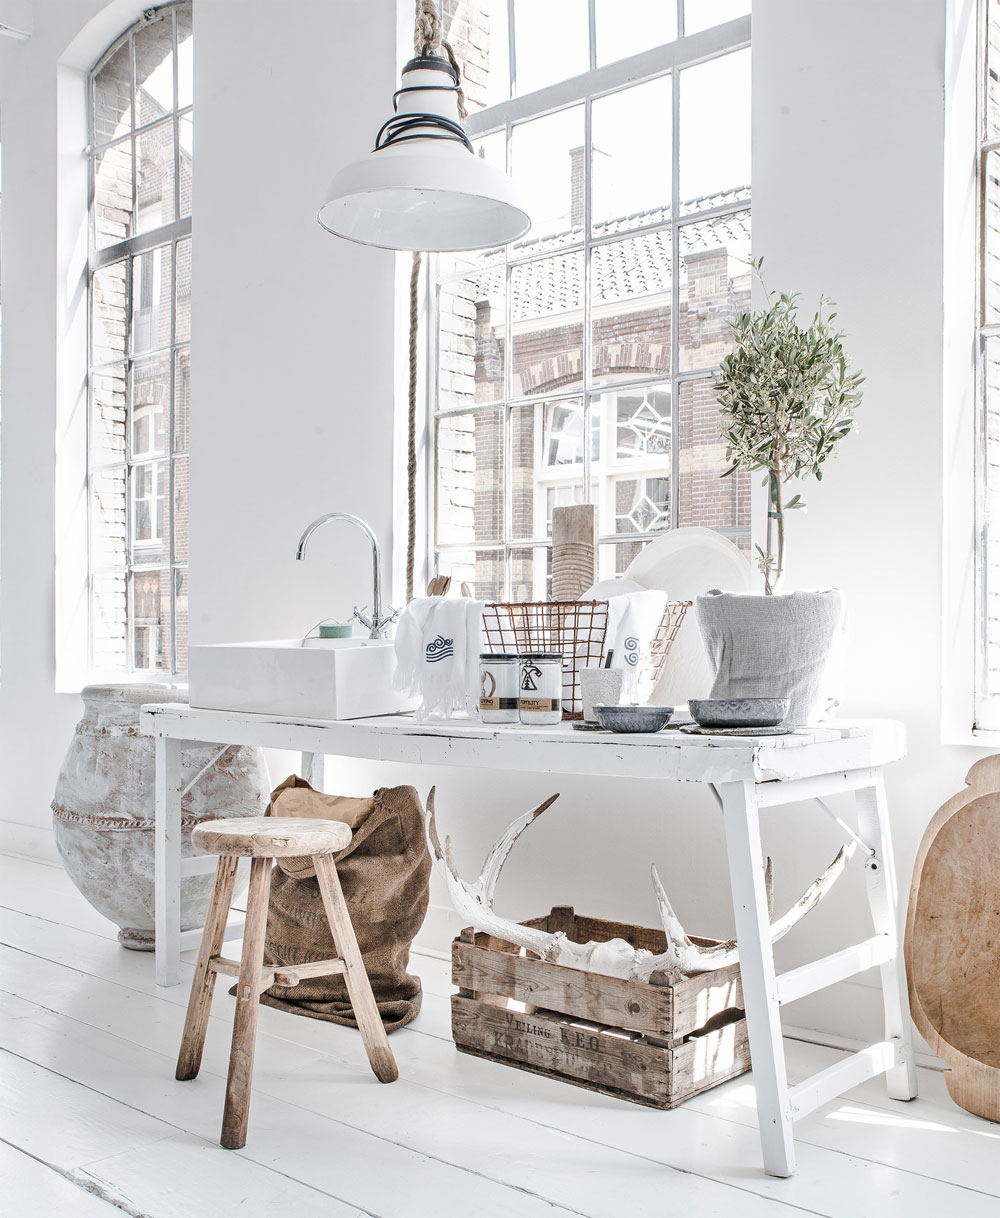 oracle, fox, sunday, sanctuary, paulina, arcklin, minimal, white, interior, design, light.